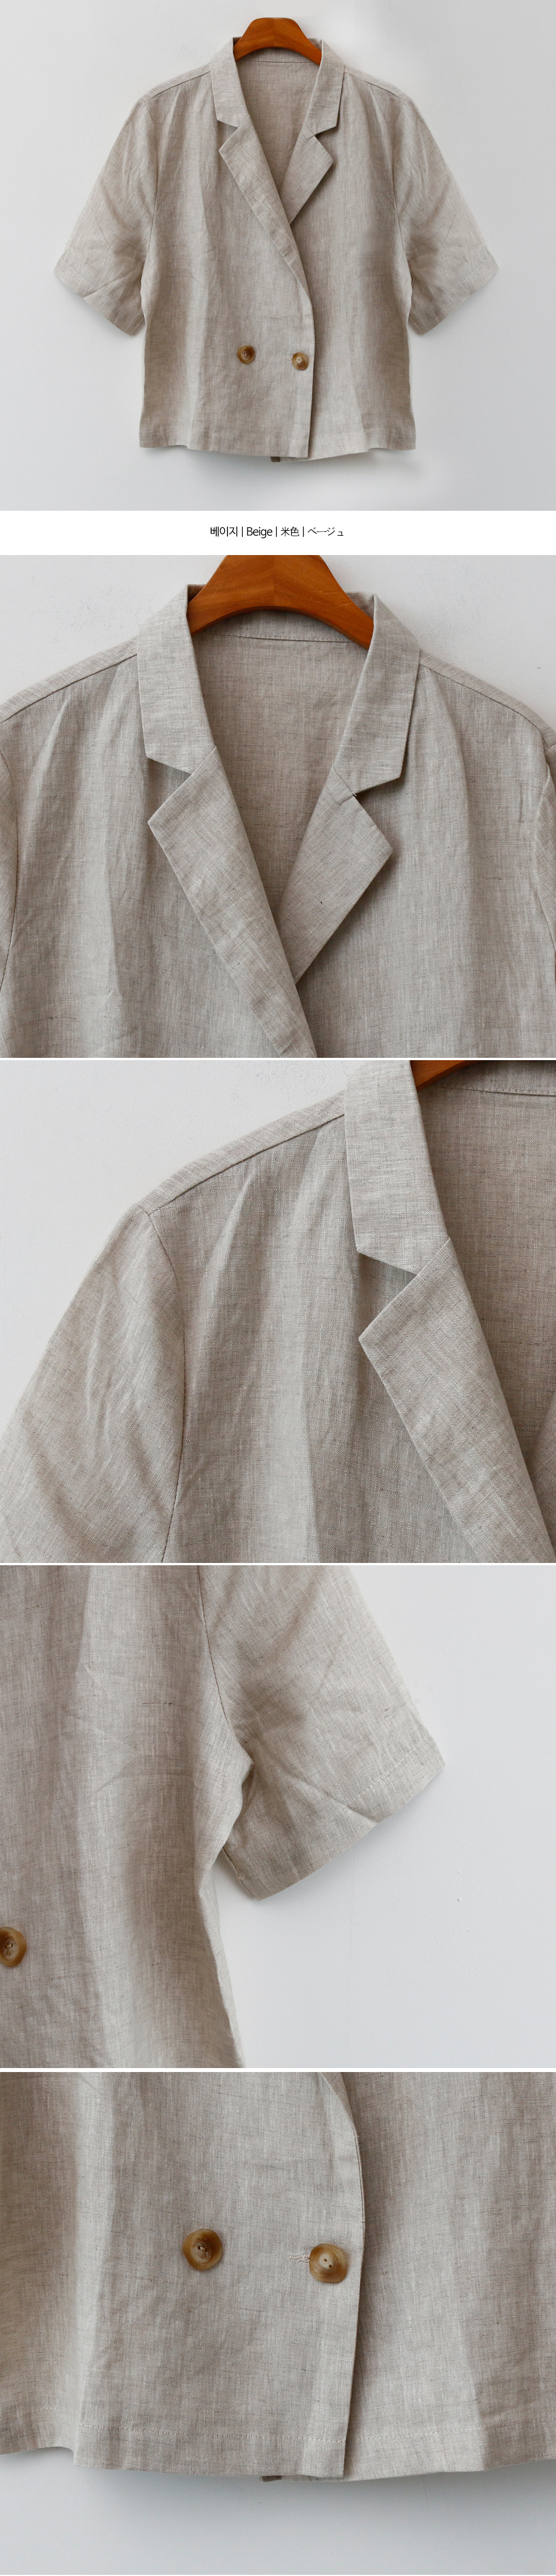 Double linen jacket